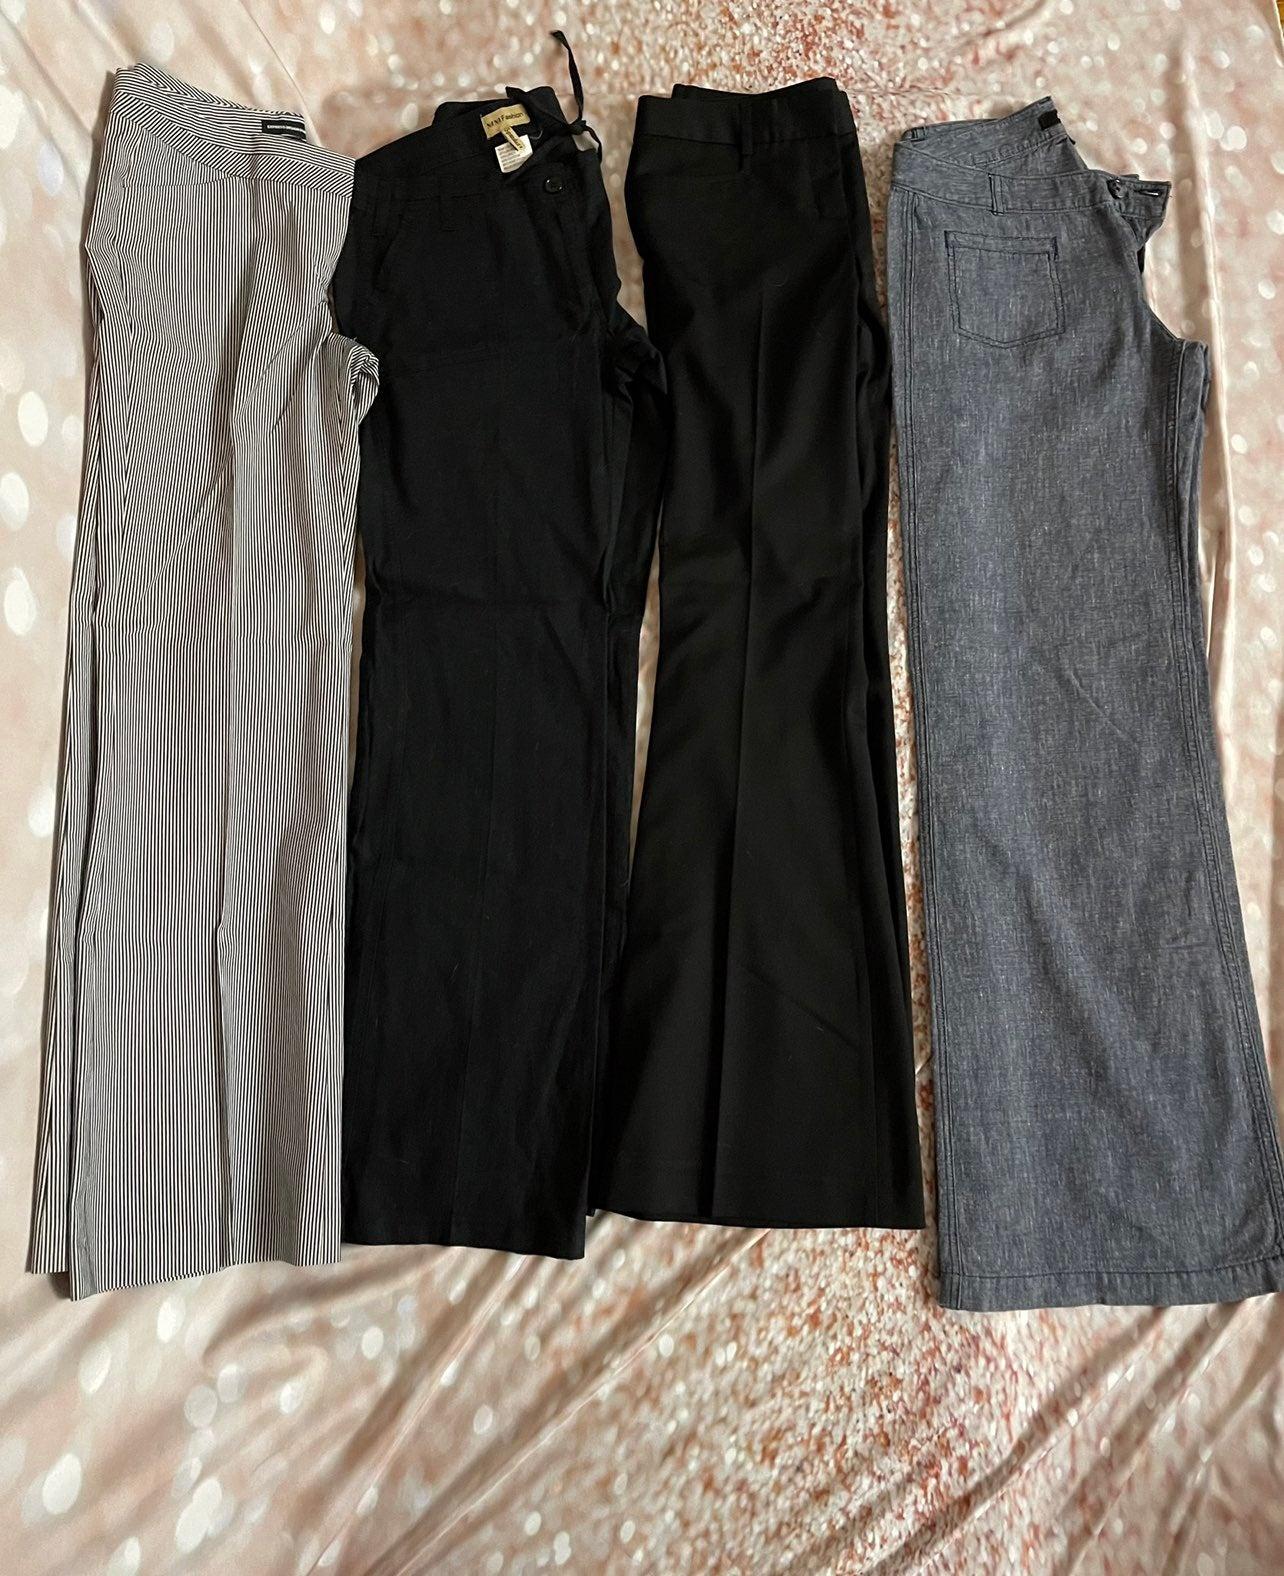 Set of 4 dress pants